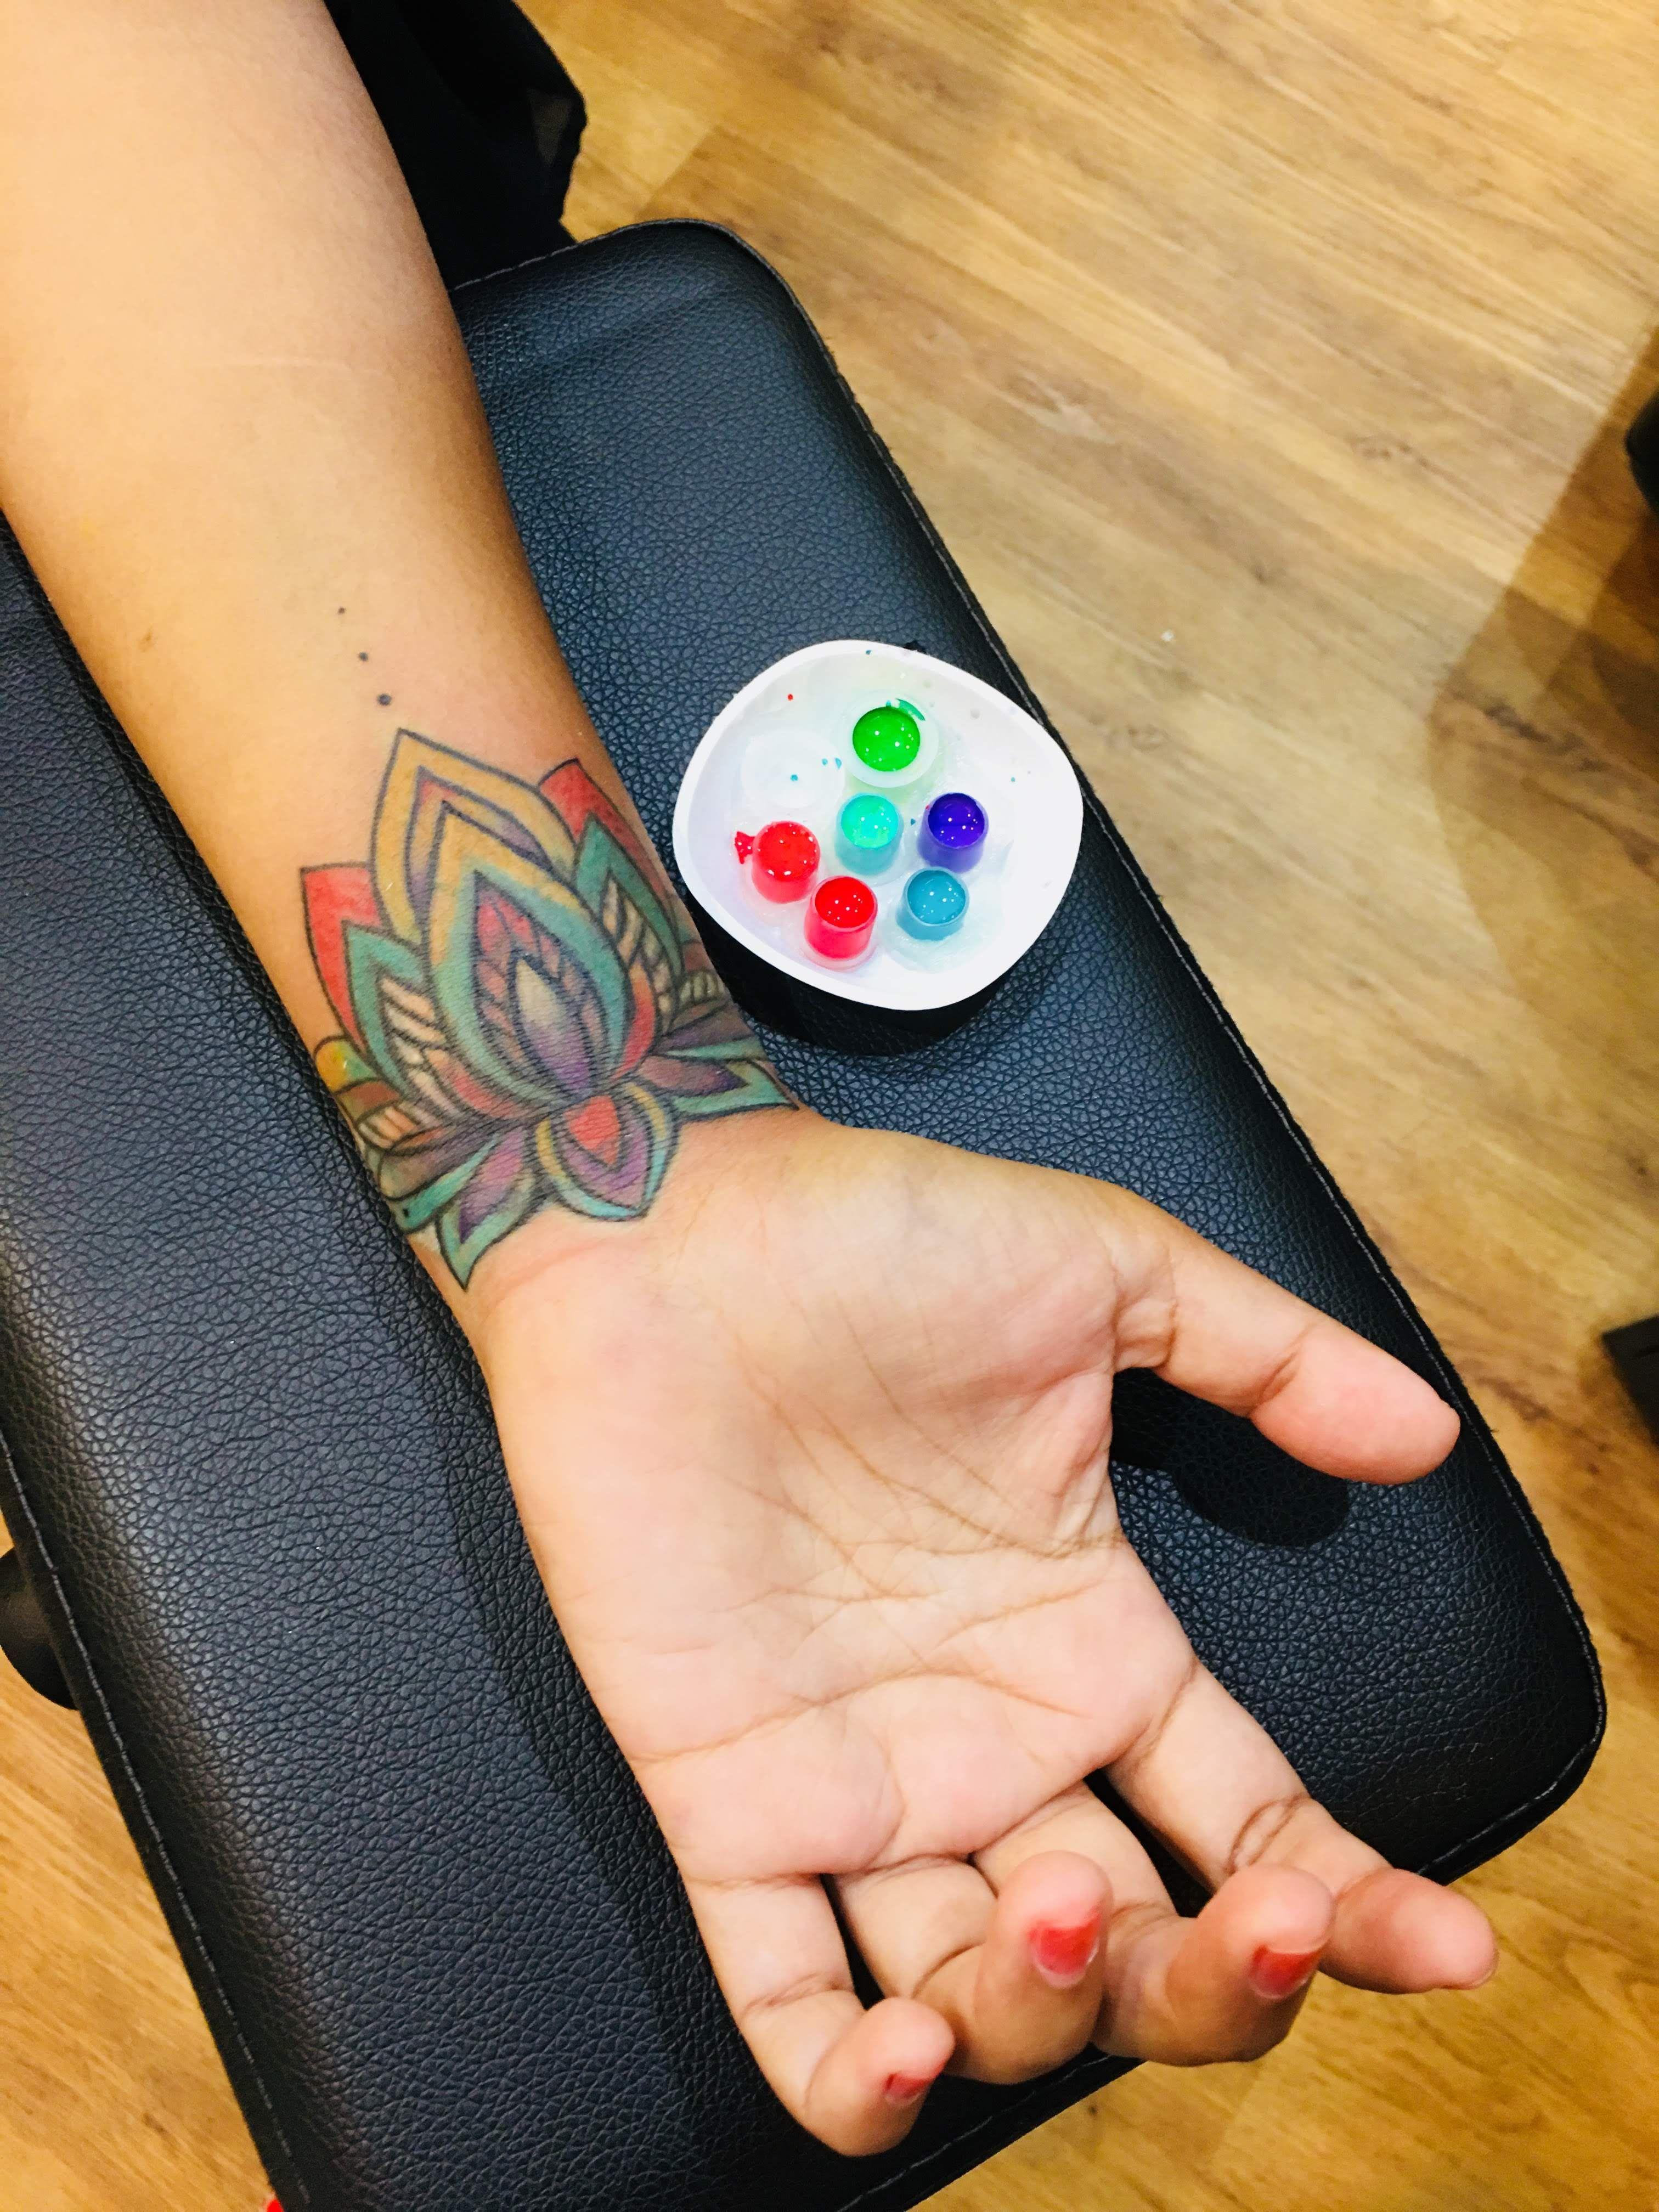 Rainbow Coloured Lotus Tattoo Tattoo Artist Sumithra Debi Johnny Two Thumb Pte Ltd The Original Johnny Tw Sugar Skull Tattoos Body Art Tattoos Thumb Tattoos